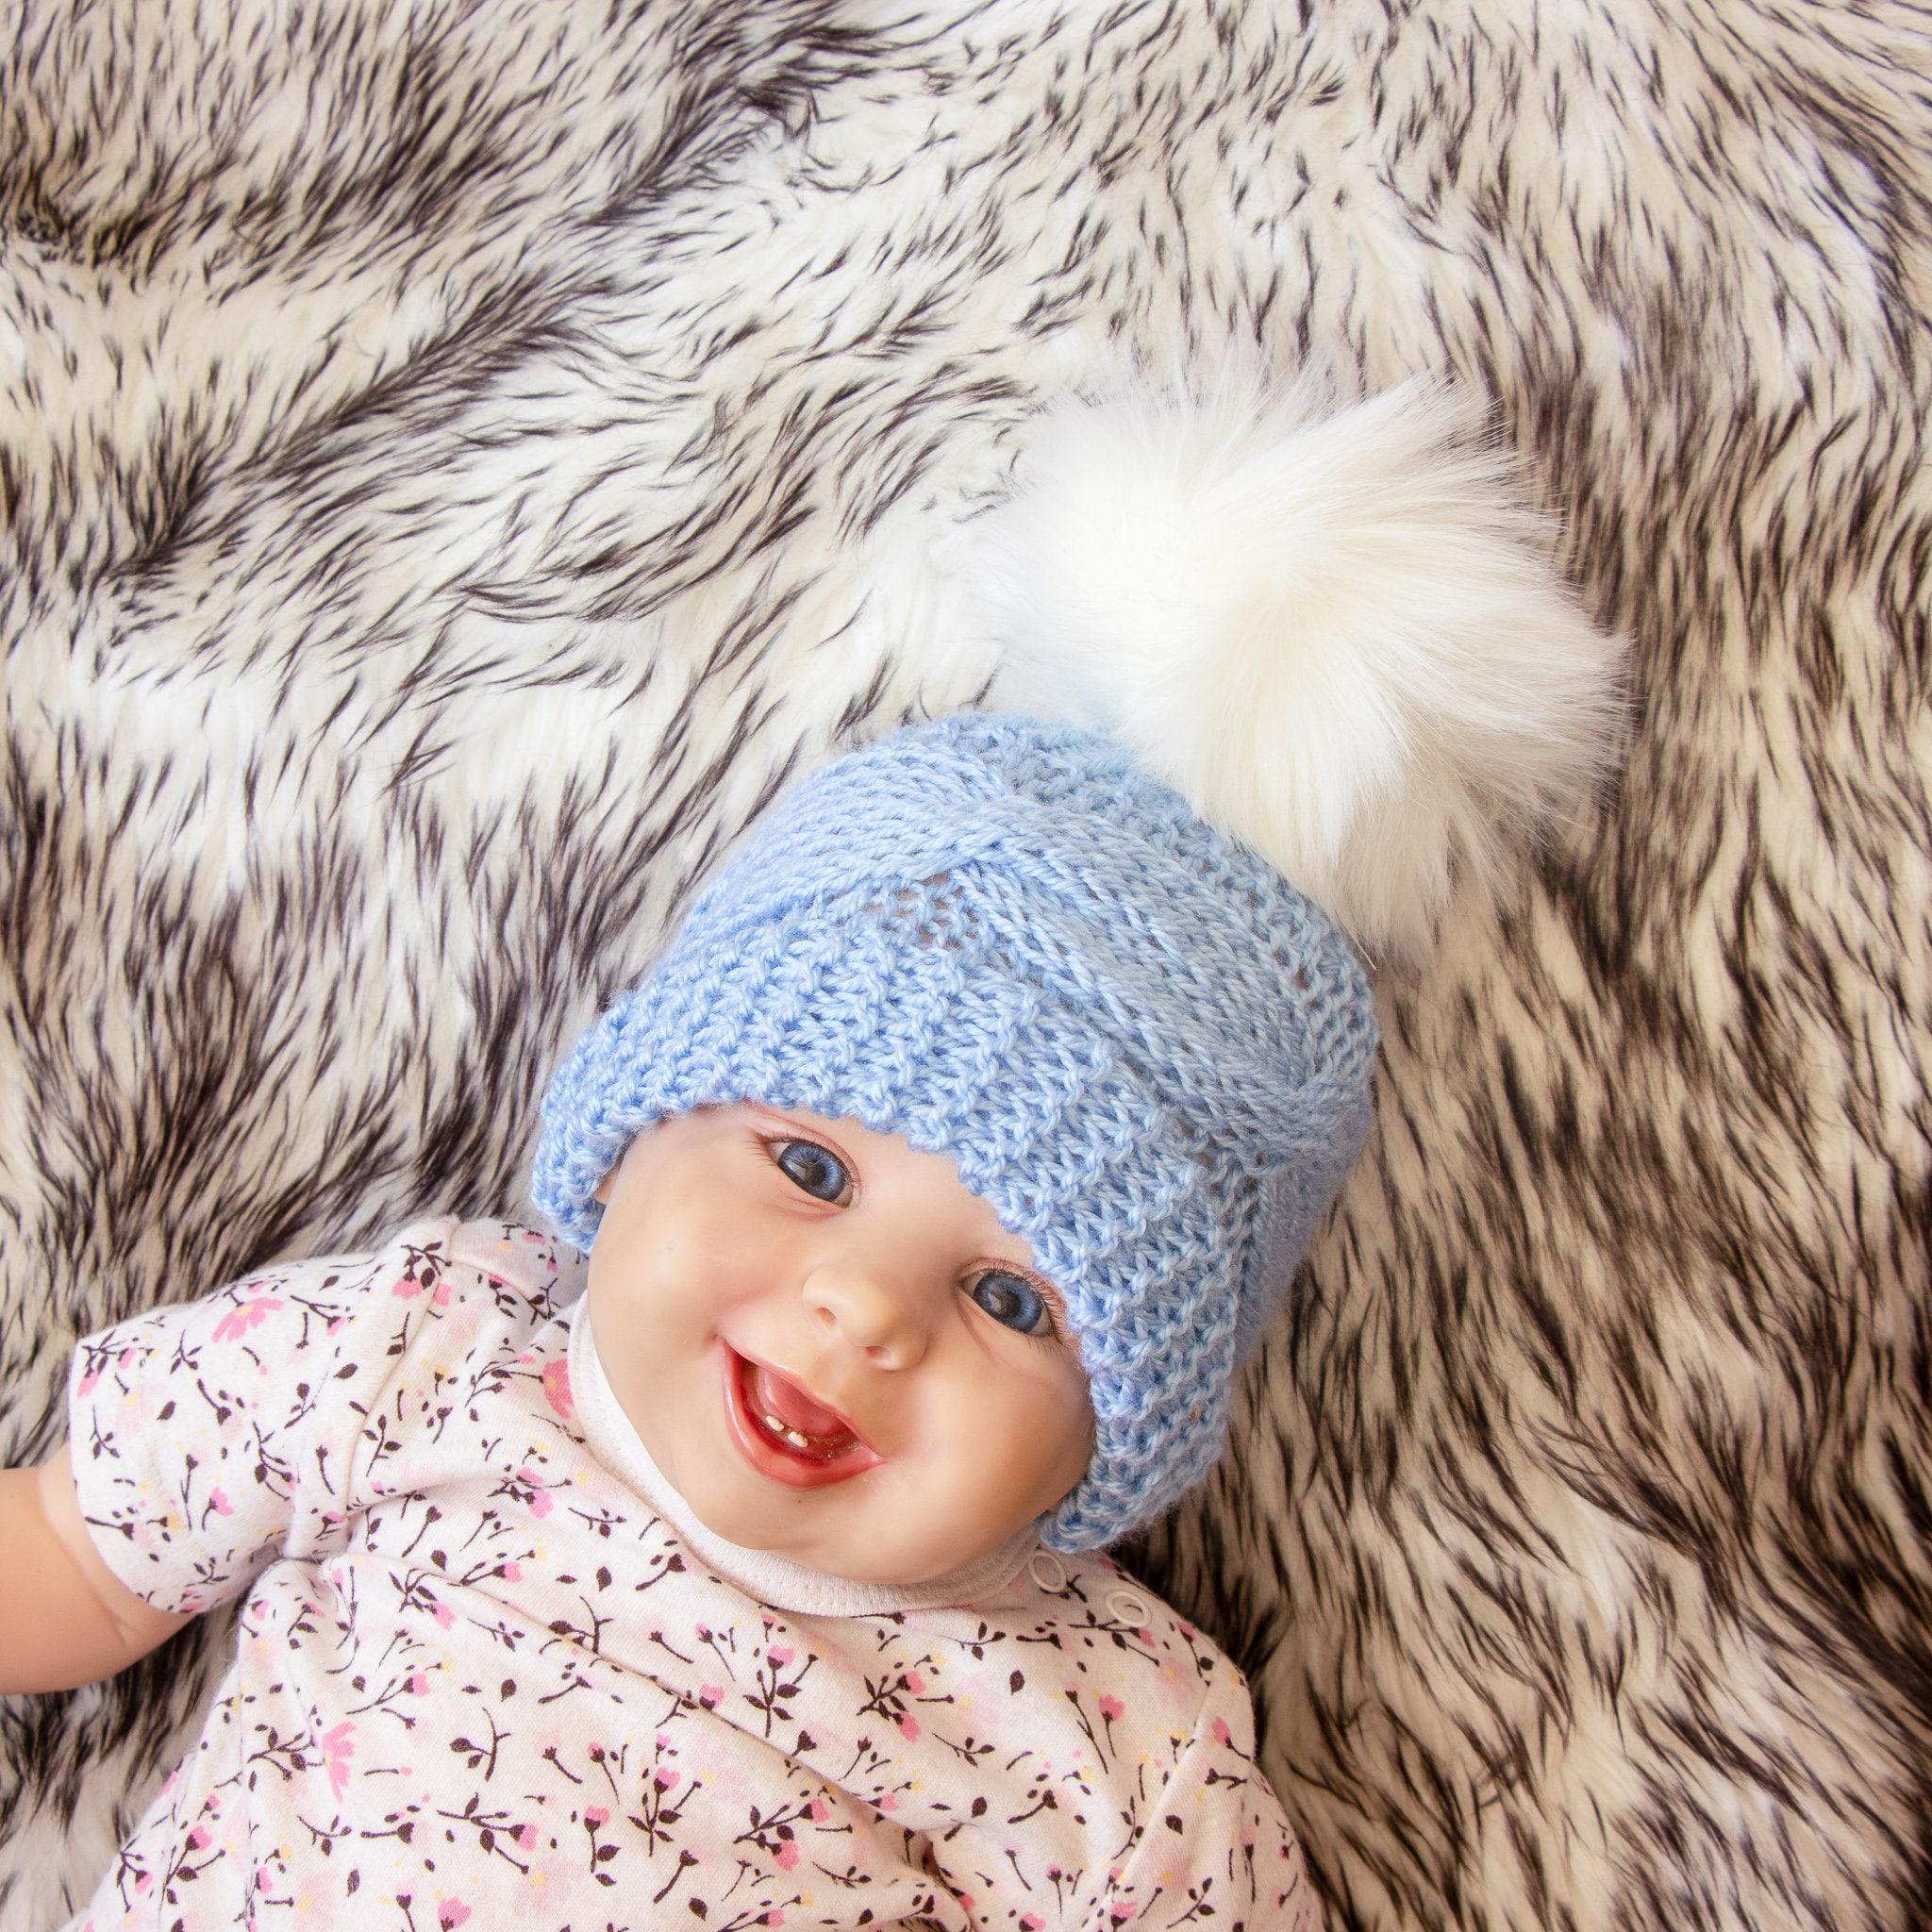 b2bf8edbf05 Knitted hat with faux fur pom pom - Blue baby hat - Baby boy hat